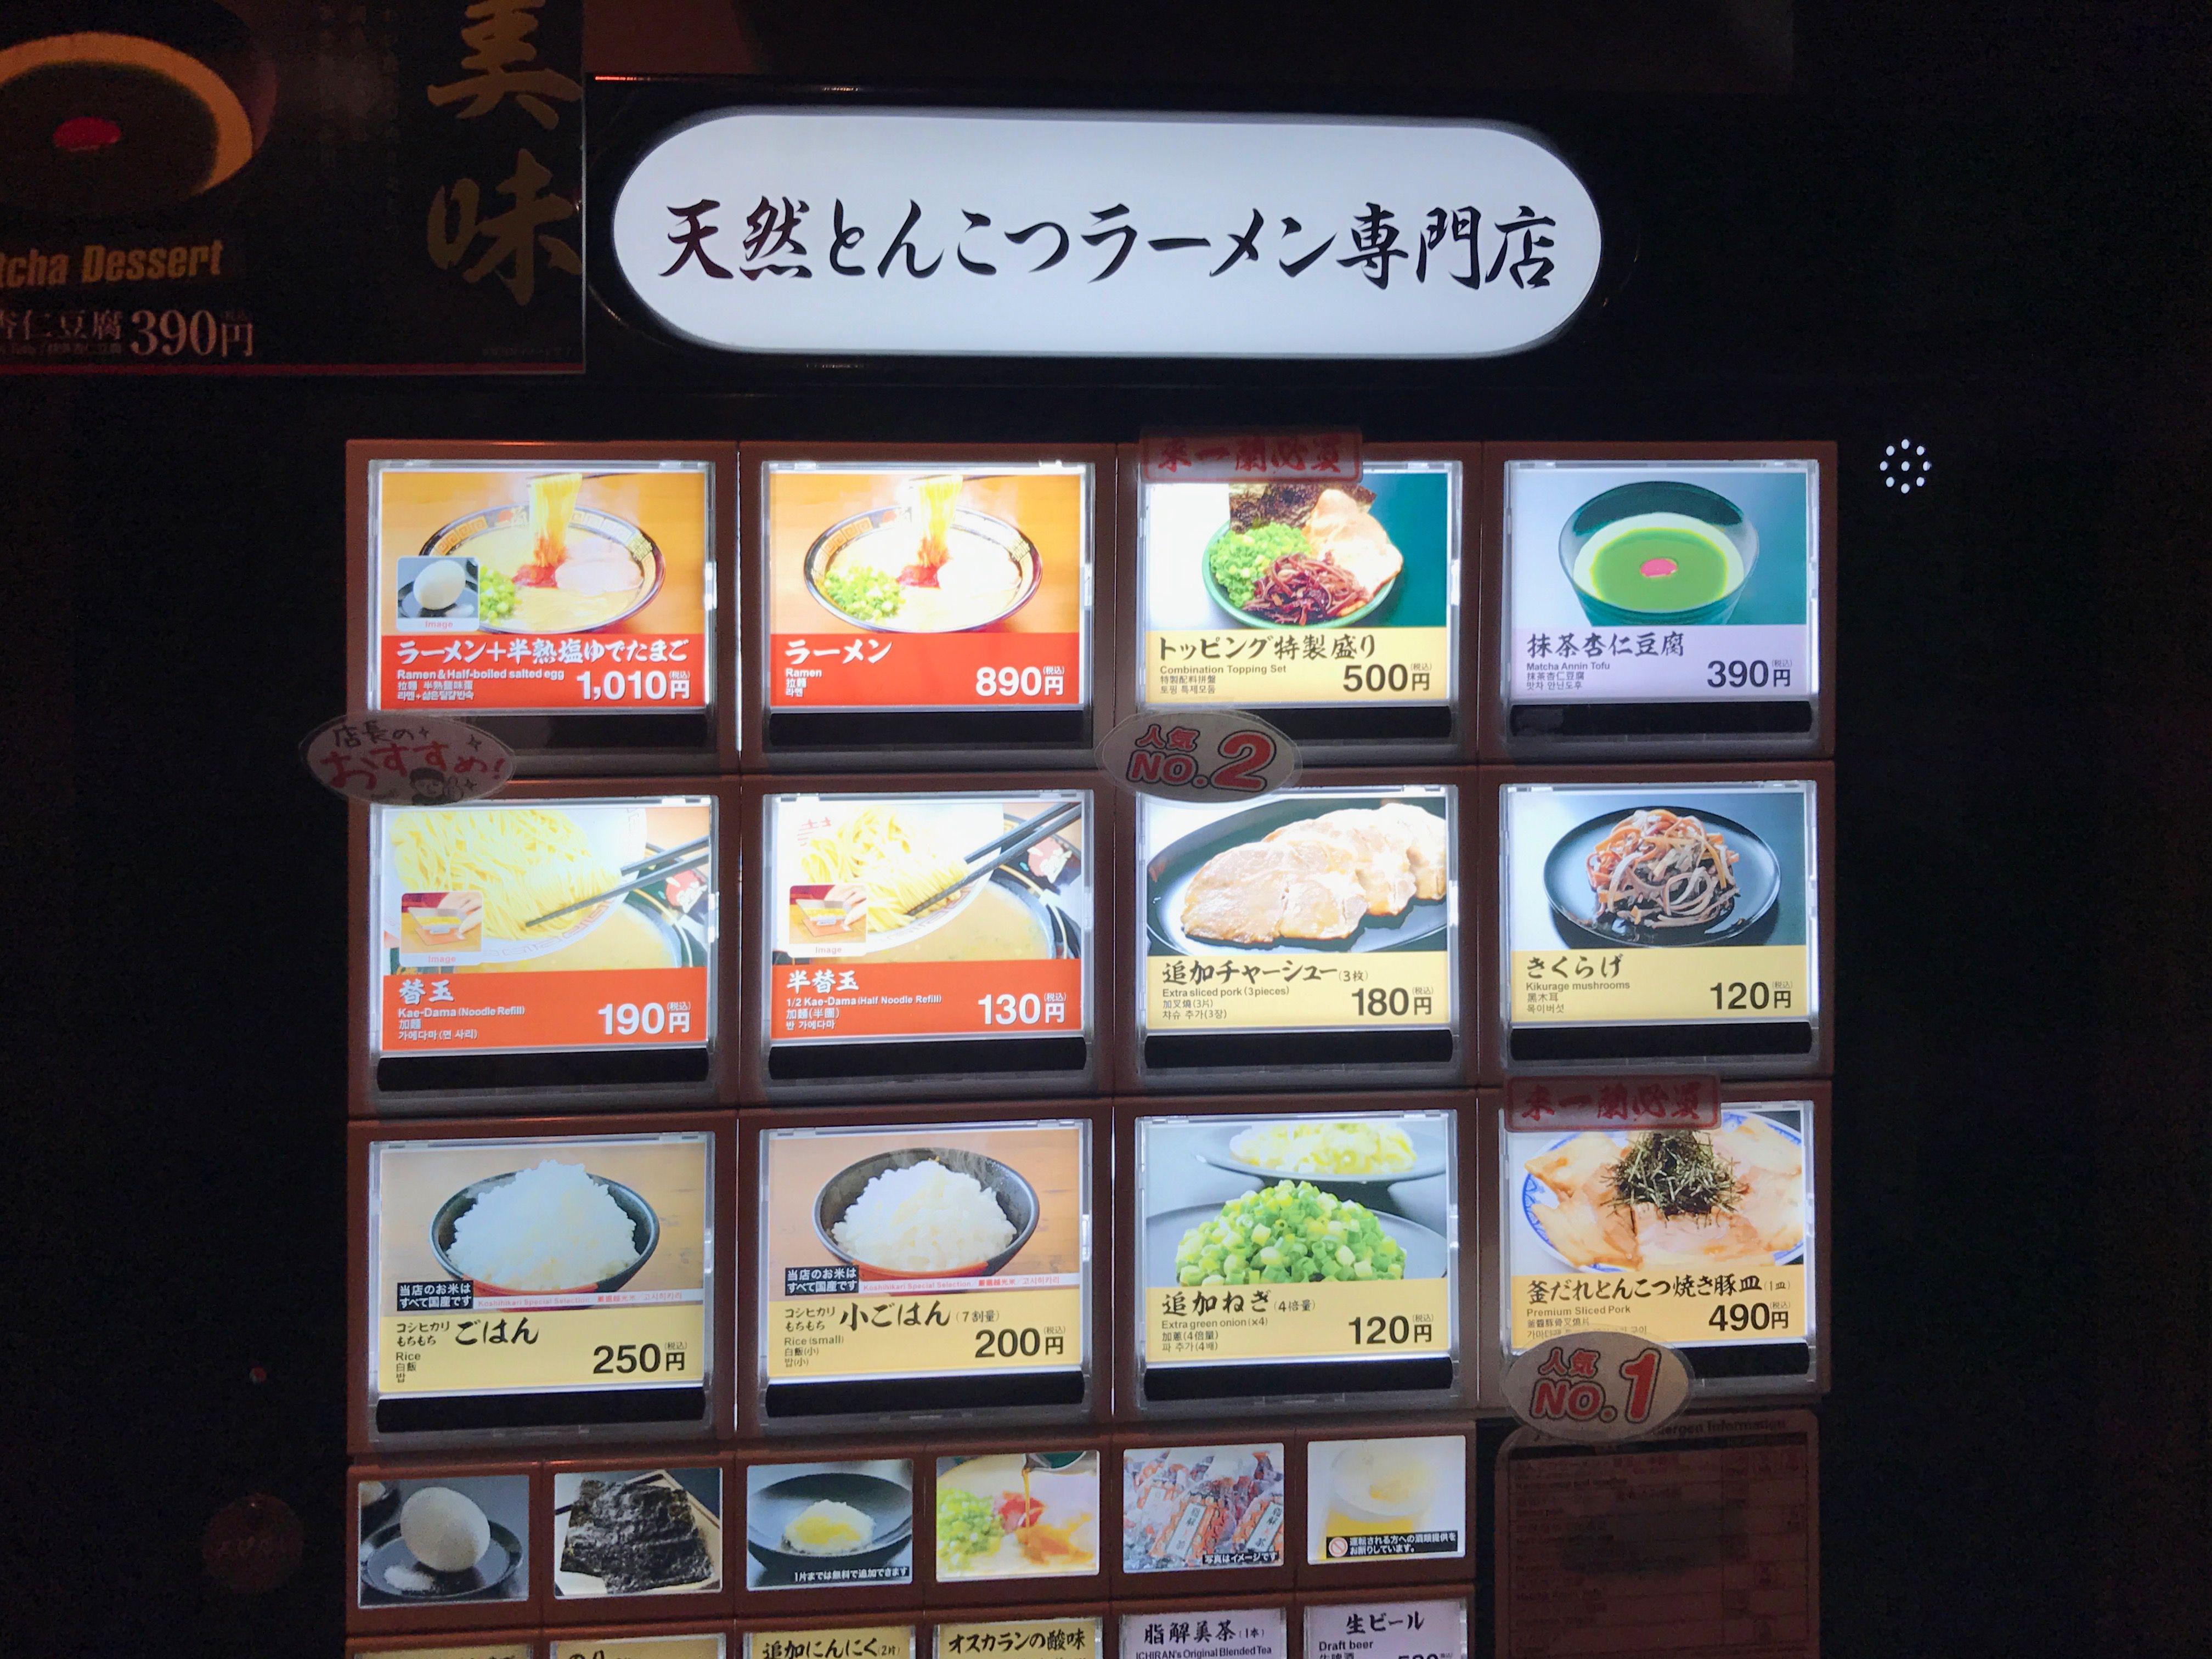 Ichiran Ramen menu board